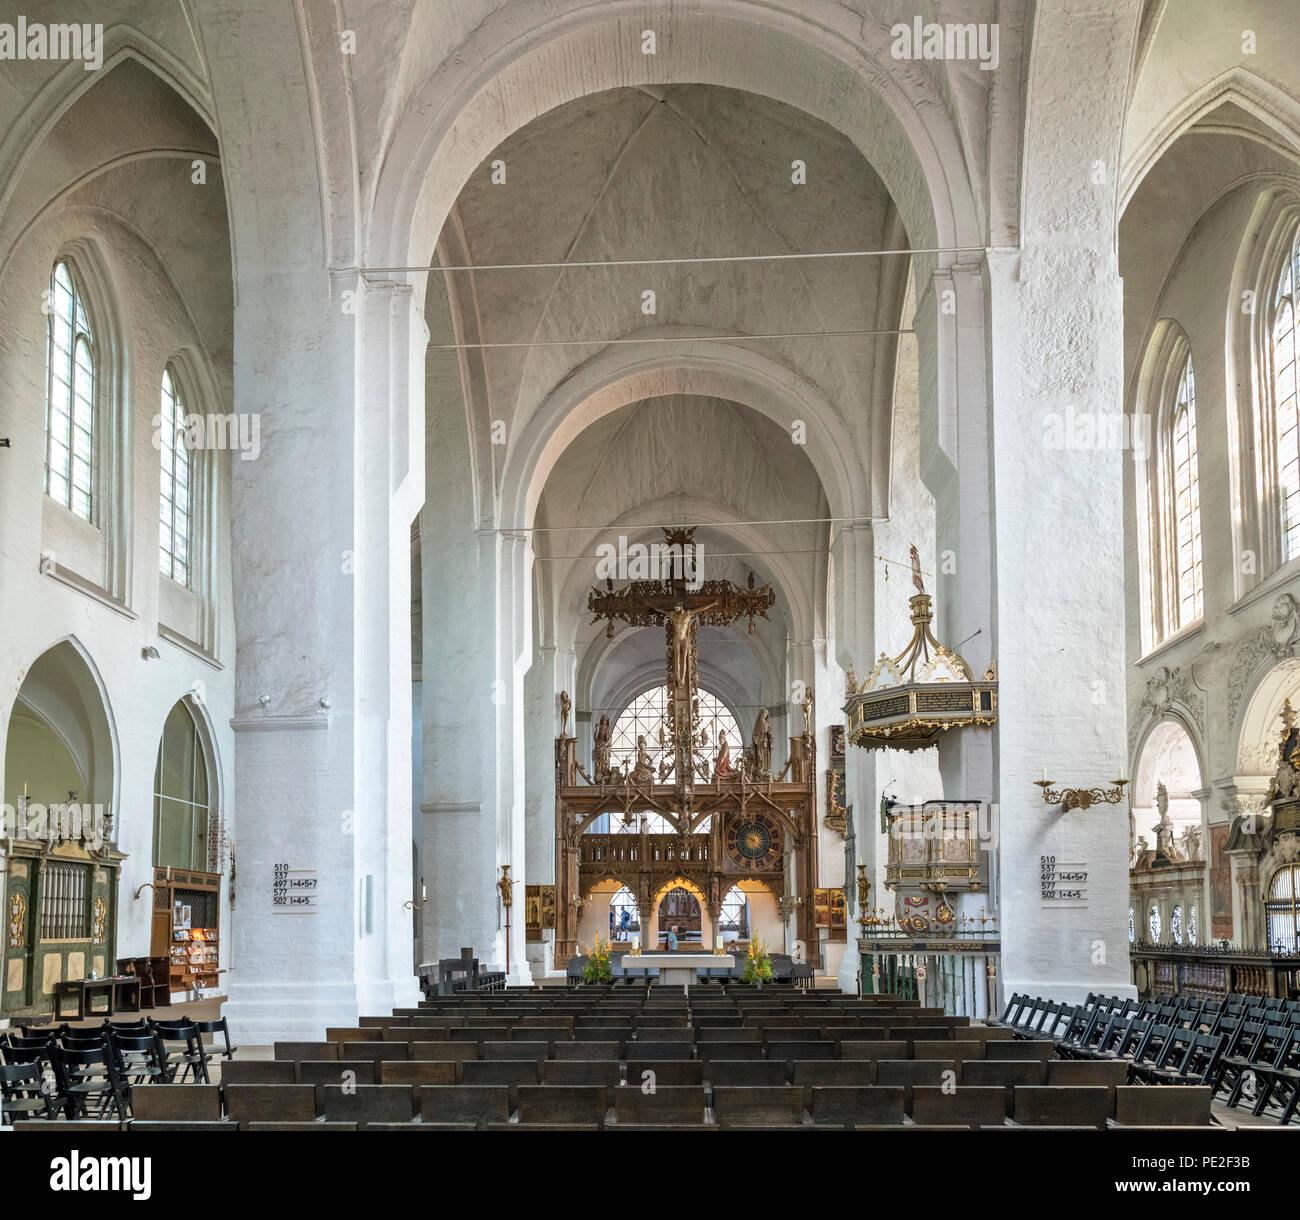 Interior de Lübeck Lübeck Dom (catedral), Lubeck, Schleswig-Holstein, Alemania Imagen De Stock